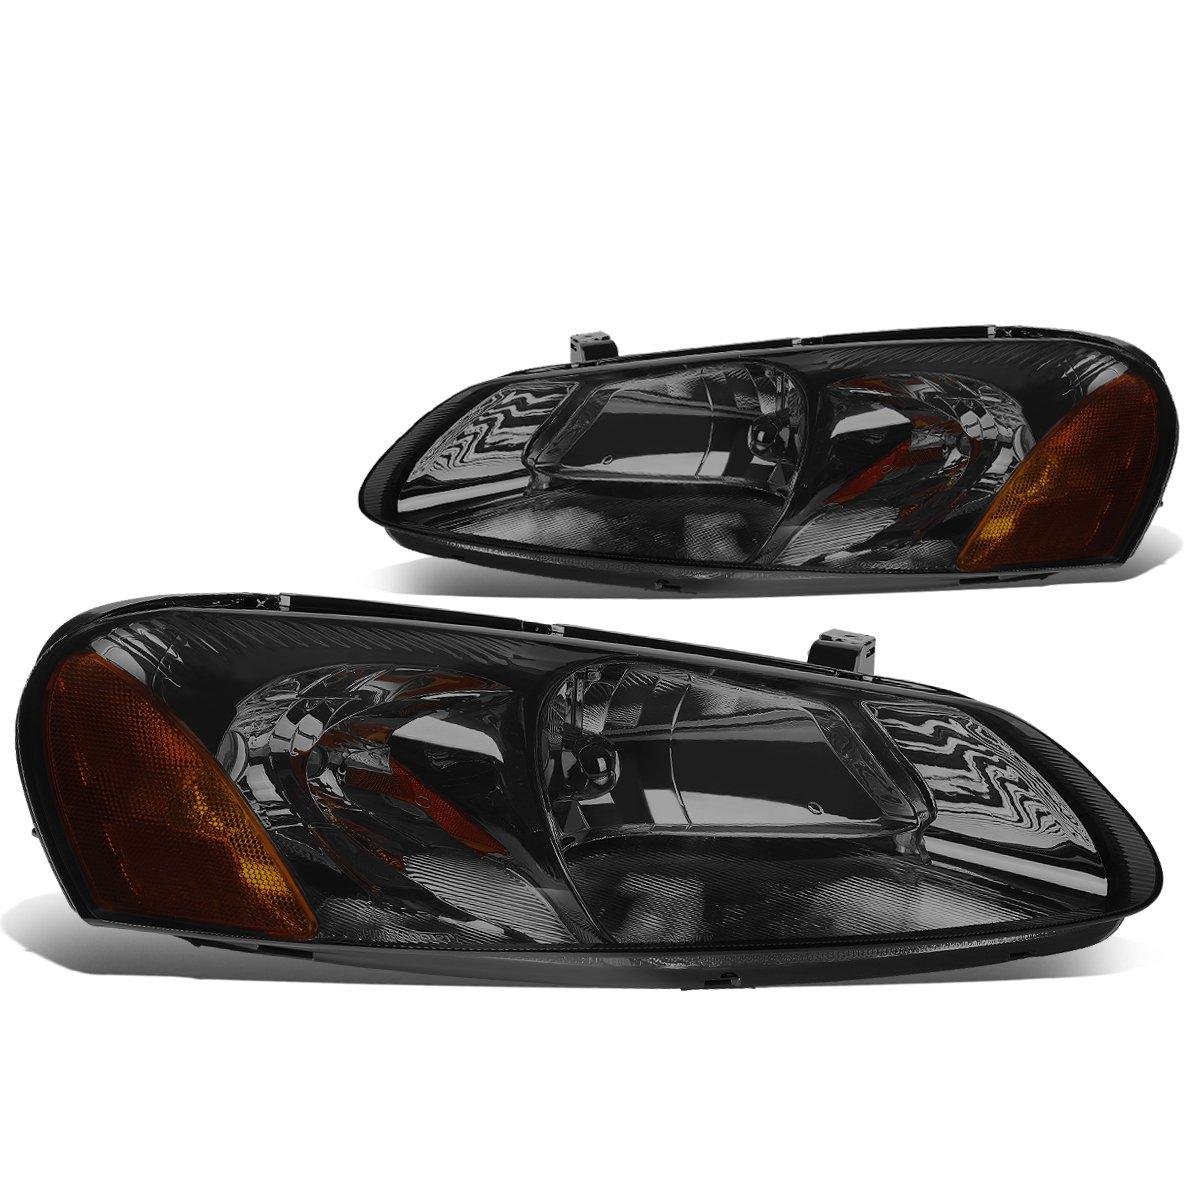 For 01-06 Chrysler Sebring Convertible//Dodge Stratus Sedan DNA Motoring HL-OH-031-SM-AM Pair of Headlight